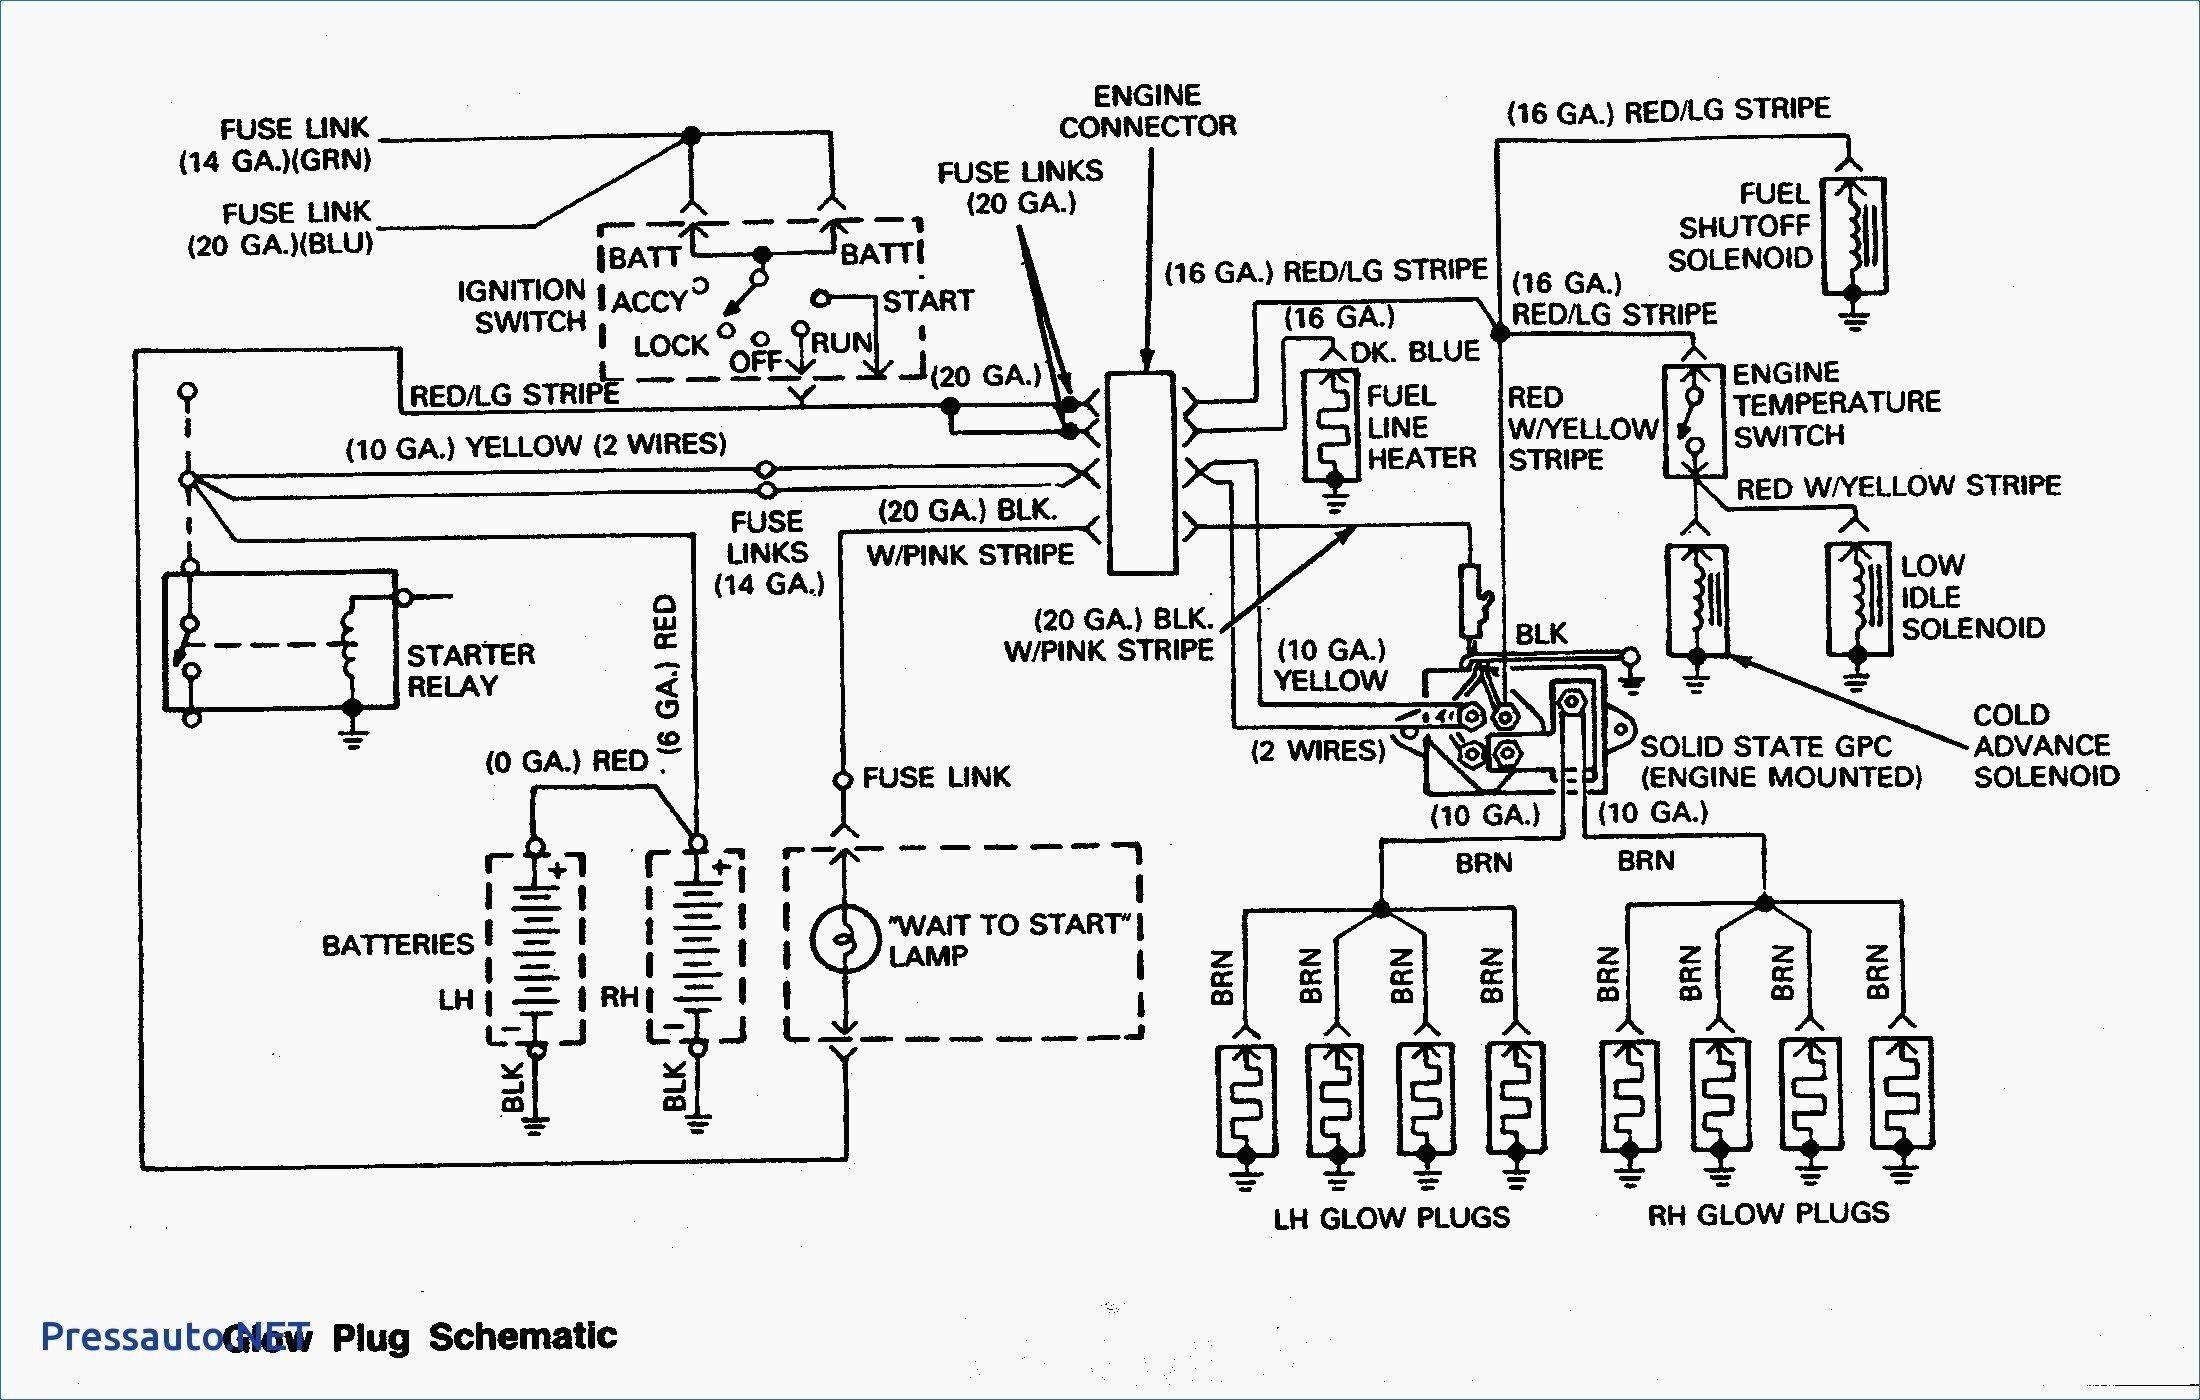 Glow Plug Relay Wiring Diagram Wiring Diagram List | Engine tune,  Powerstroke, Diagram | 2002 F250 Glow Plug Relay Wiring Diagram |  | Pinterest